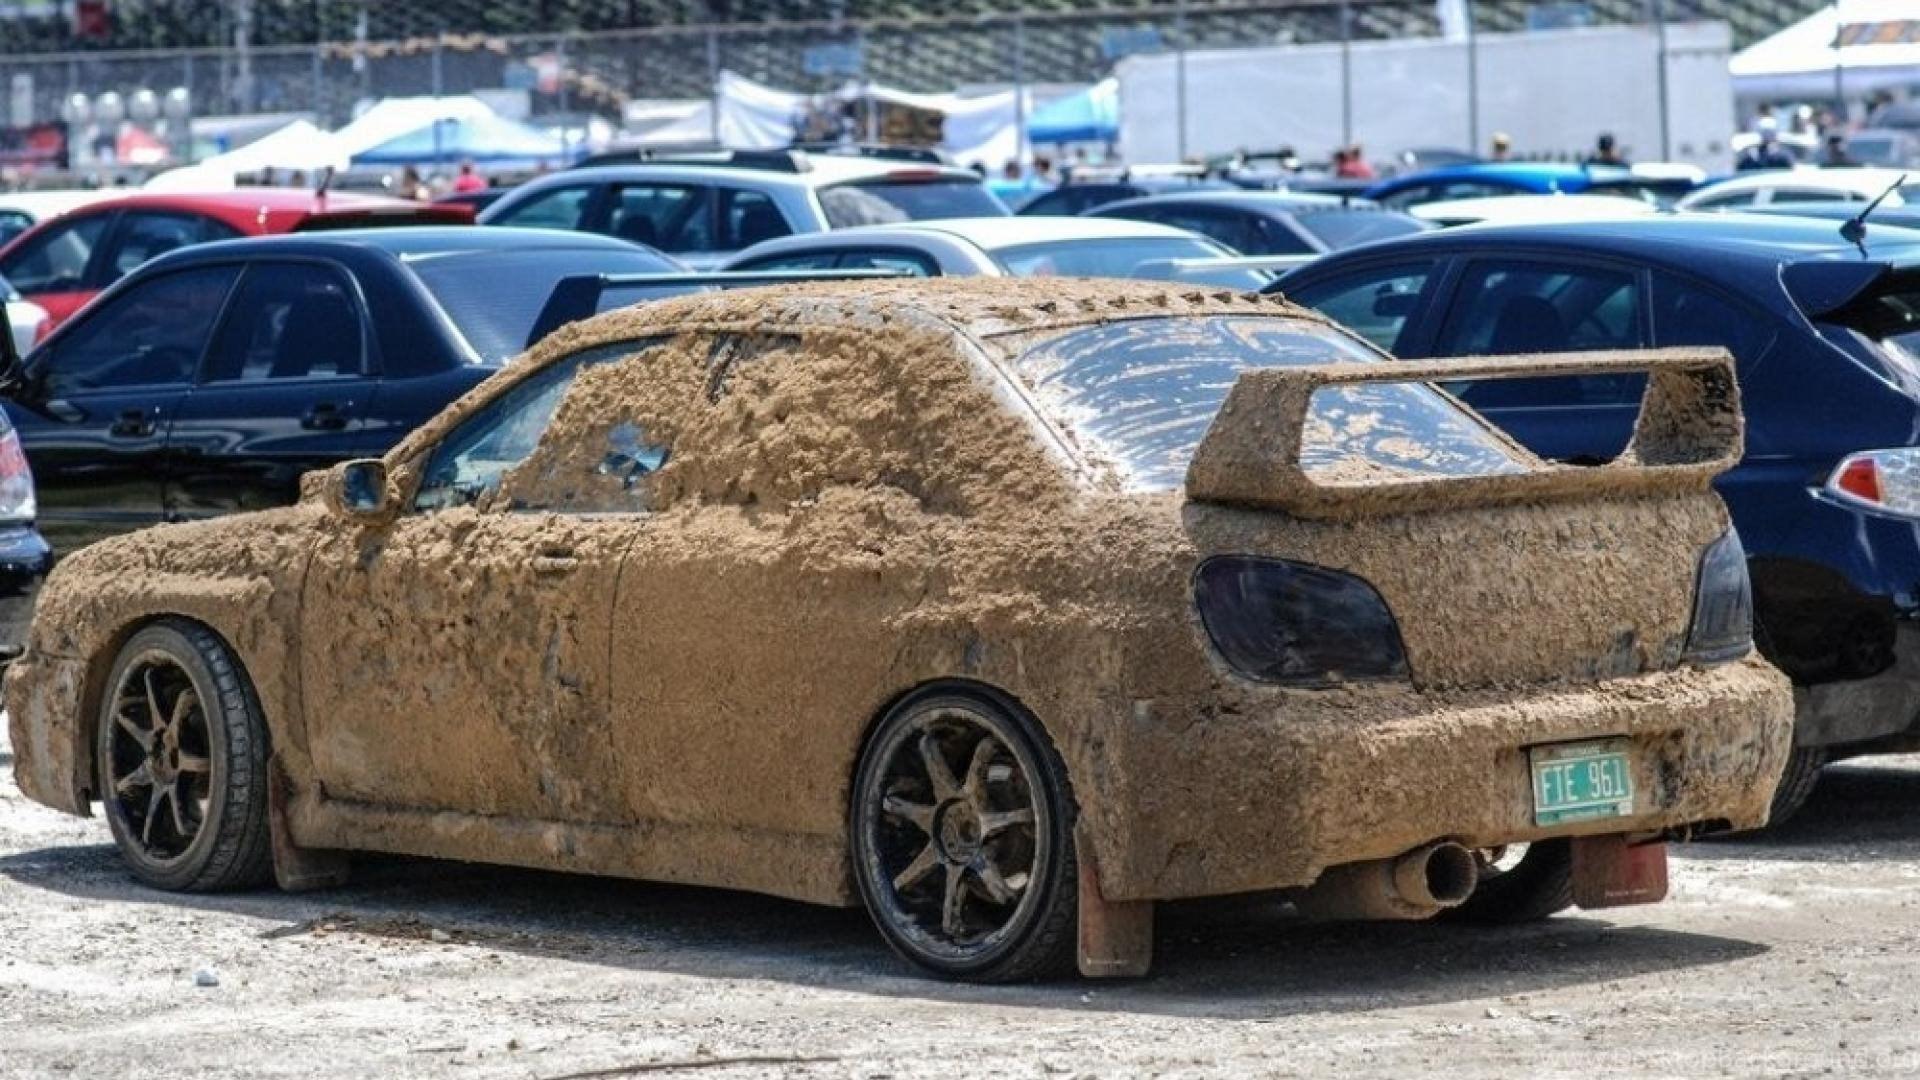 Cars Mud Subaru Impreza Wrx Sti Wallpapers Desktop Background